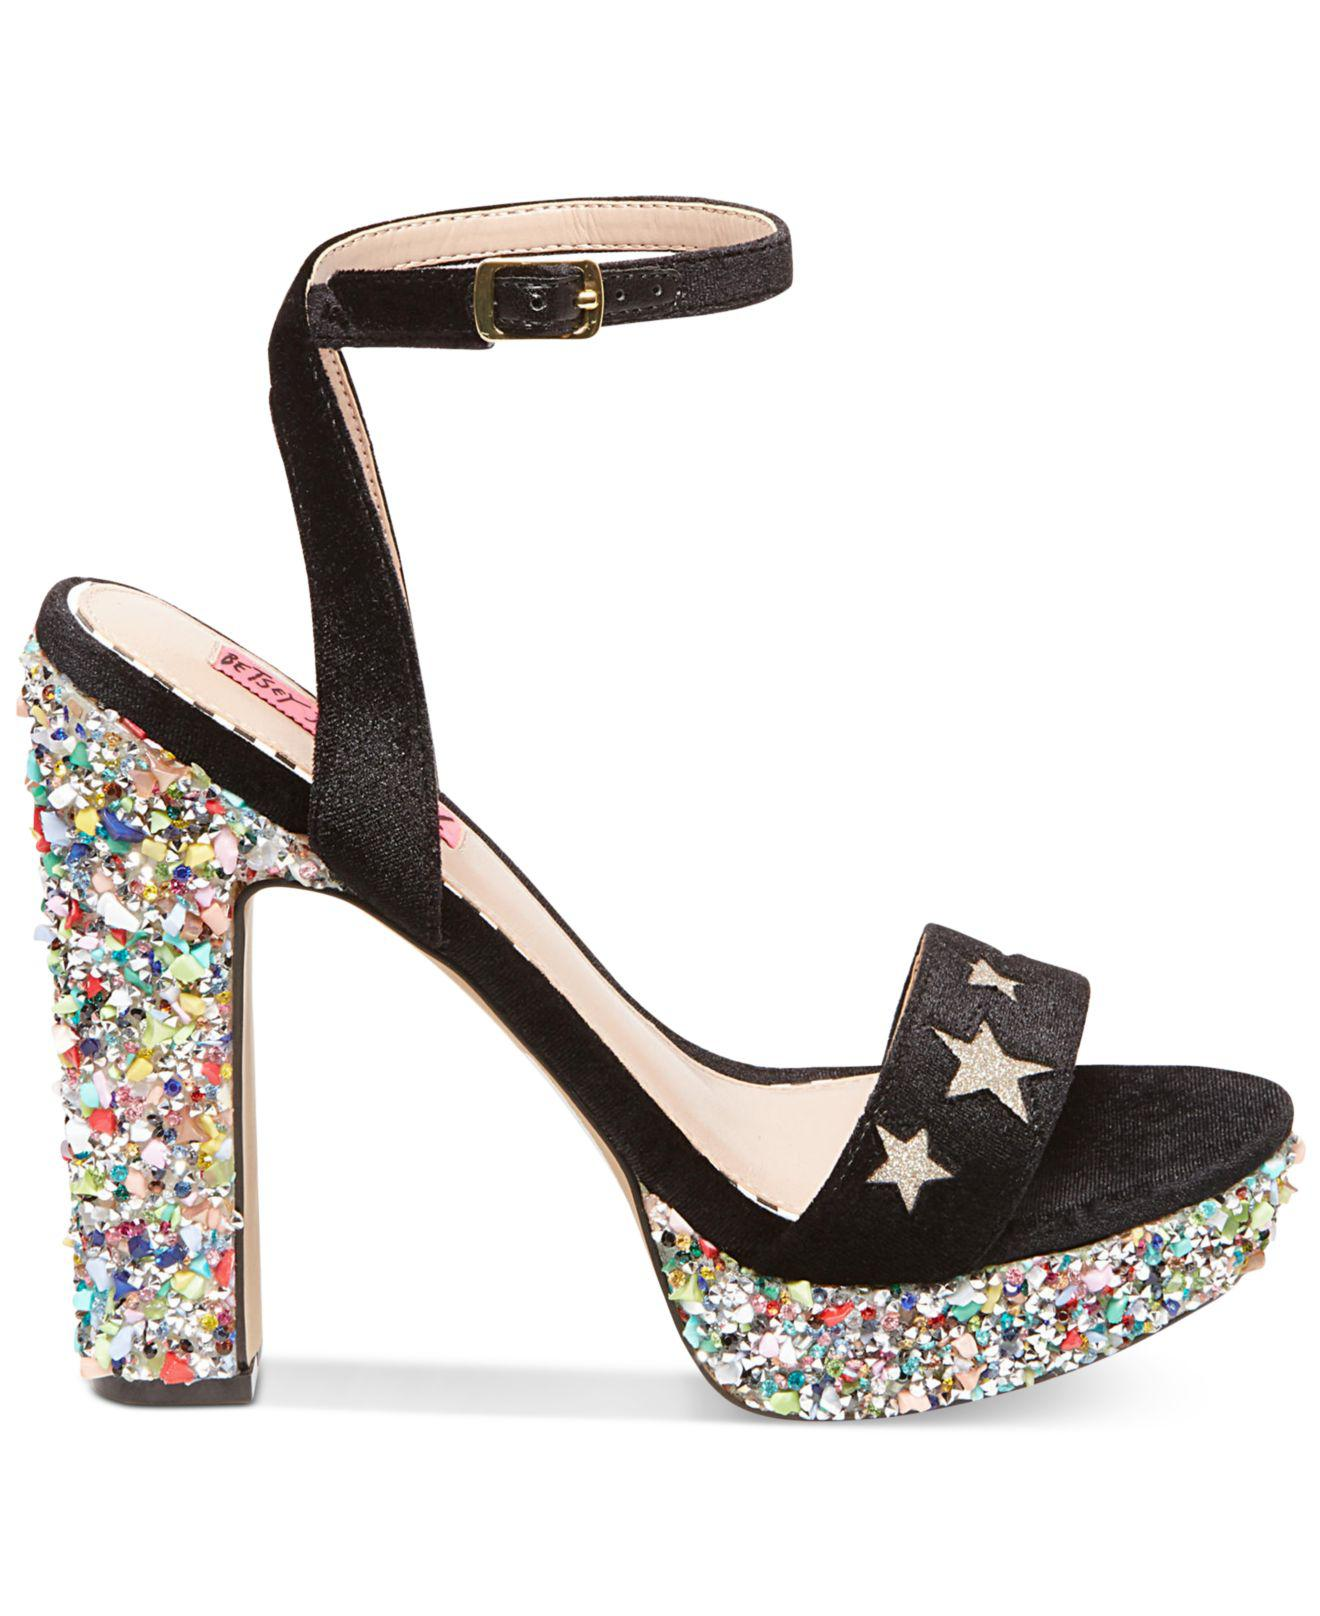 b24848f38d Betsey Johnson Kenna Platform Block-heel Sandals in Black - Lyst